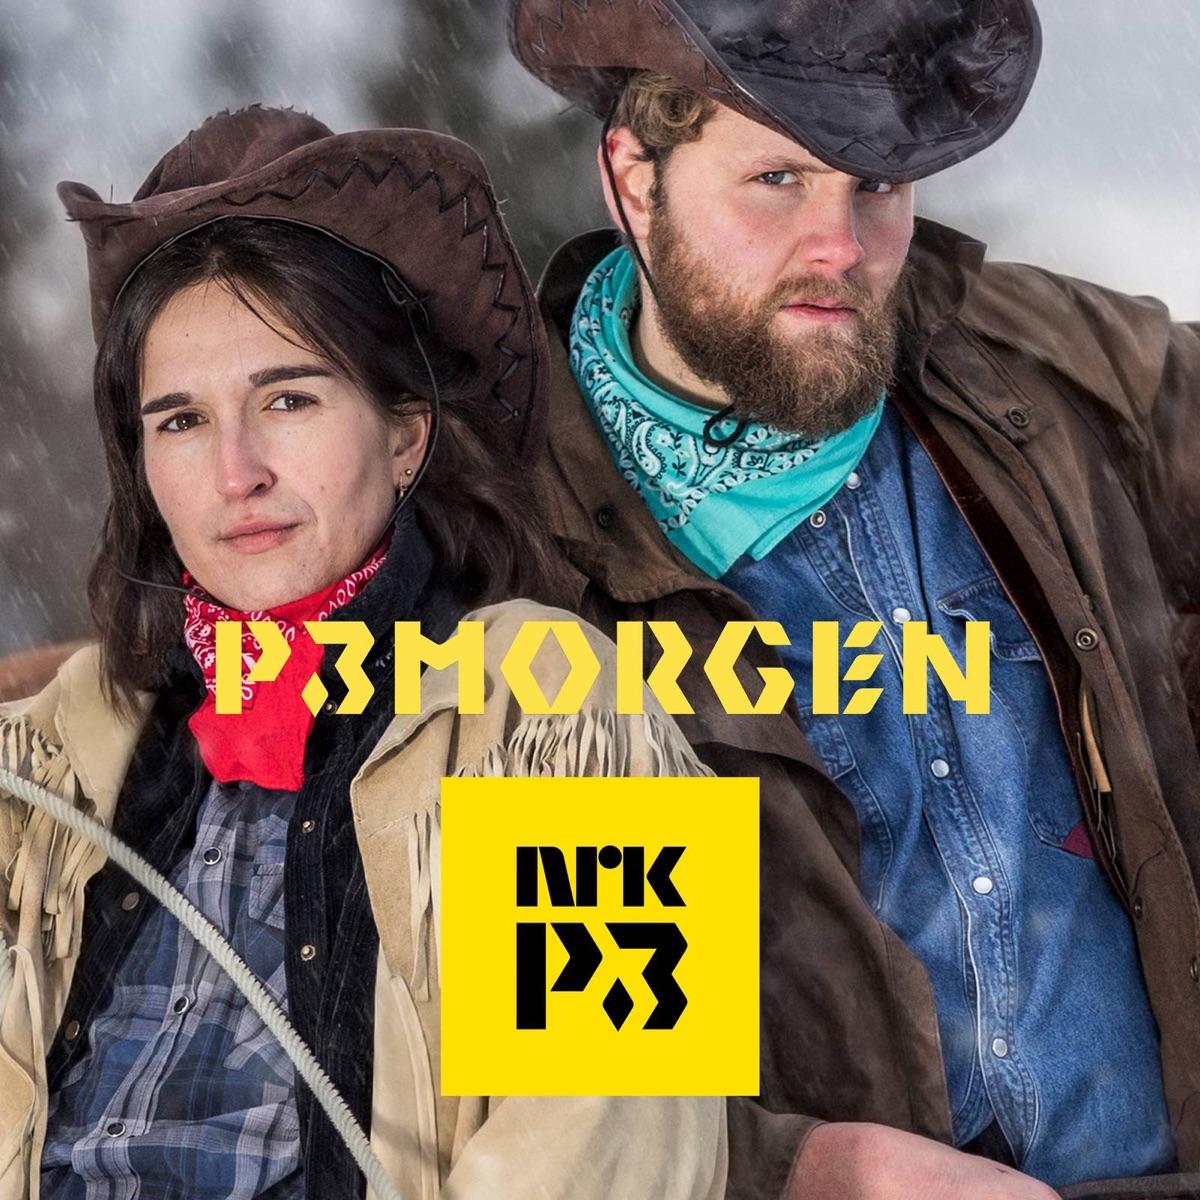 P3morgen 26.04.17: Jo Røislien